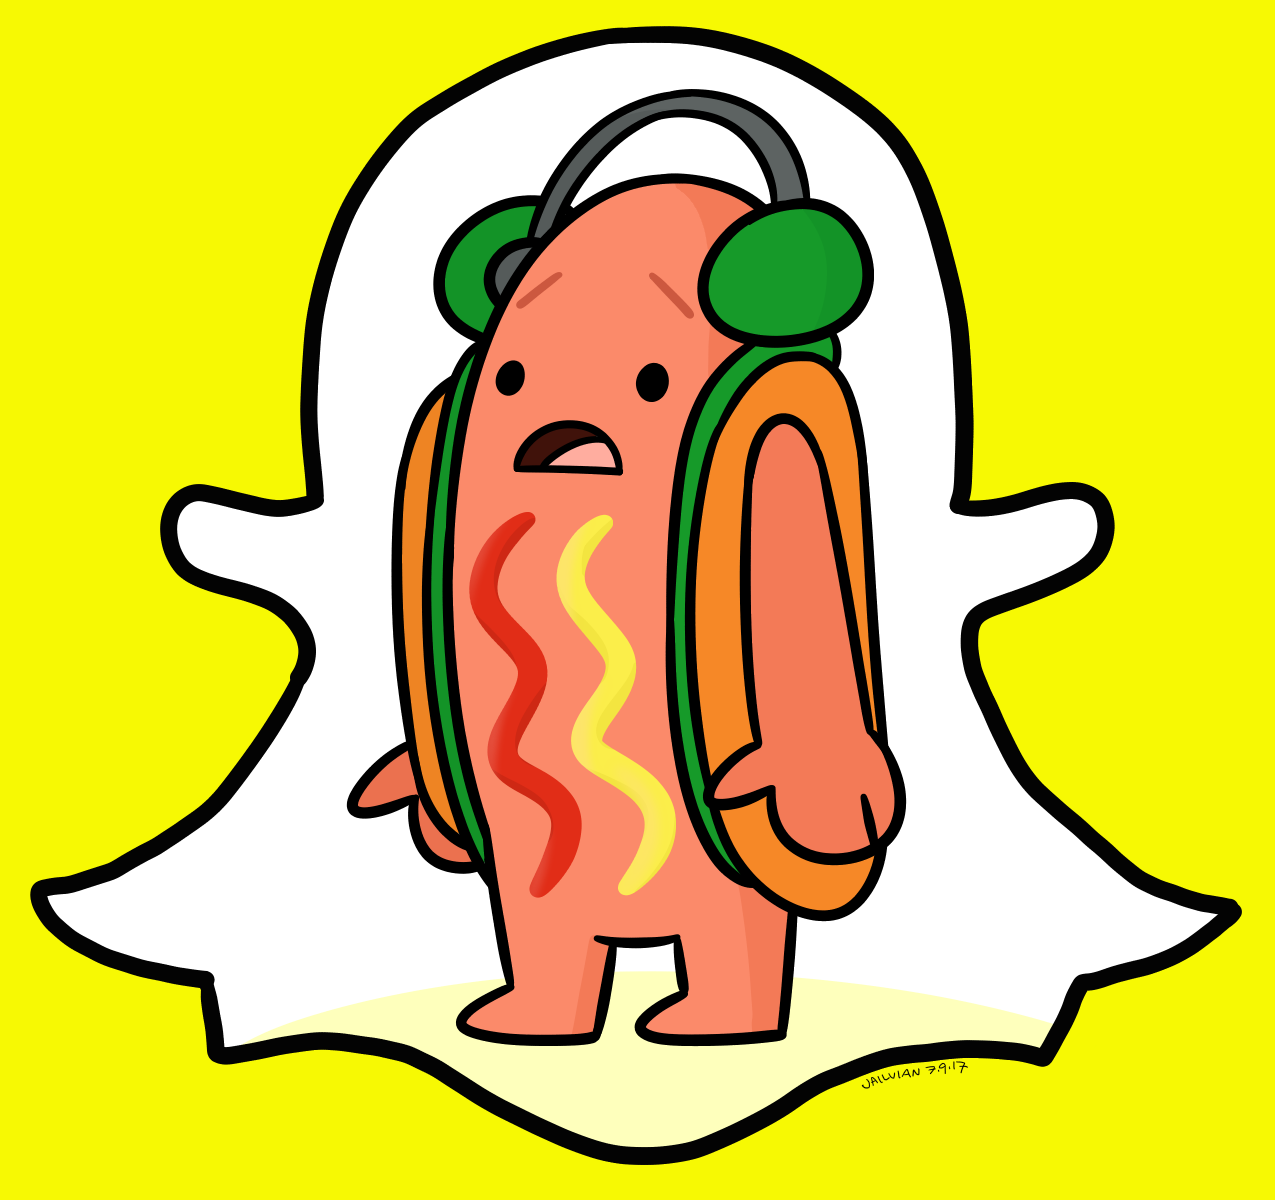 645 snapchat hotdog meme fanart dancing hot dog snapchat filter know